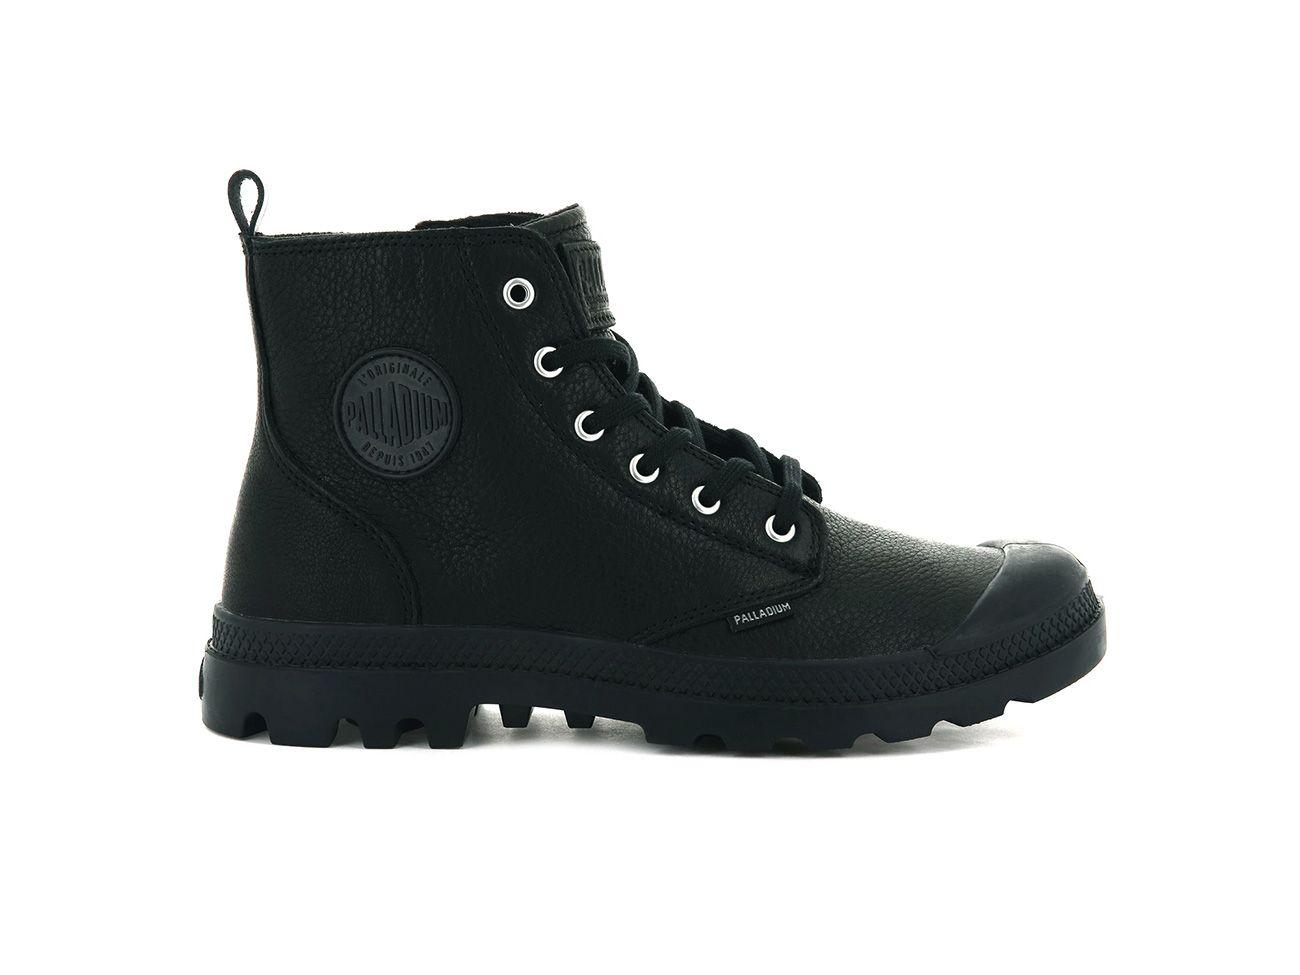 Palladium Pampa Hi Zip Leather in Black/Black